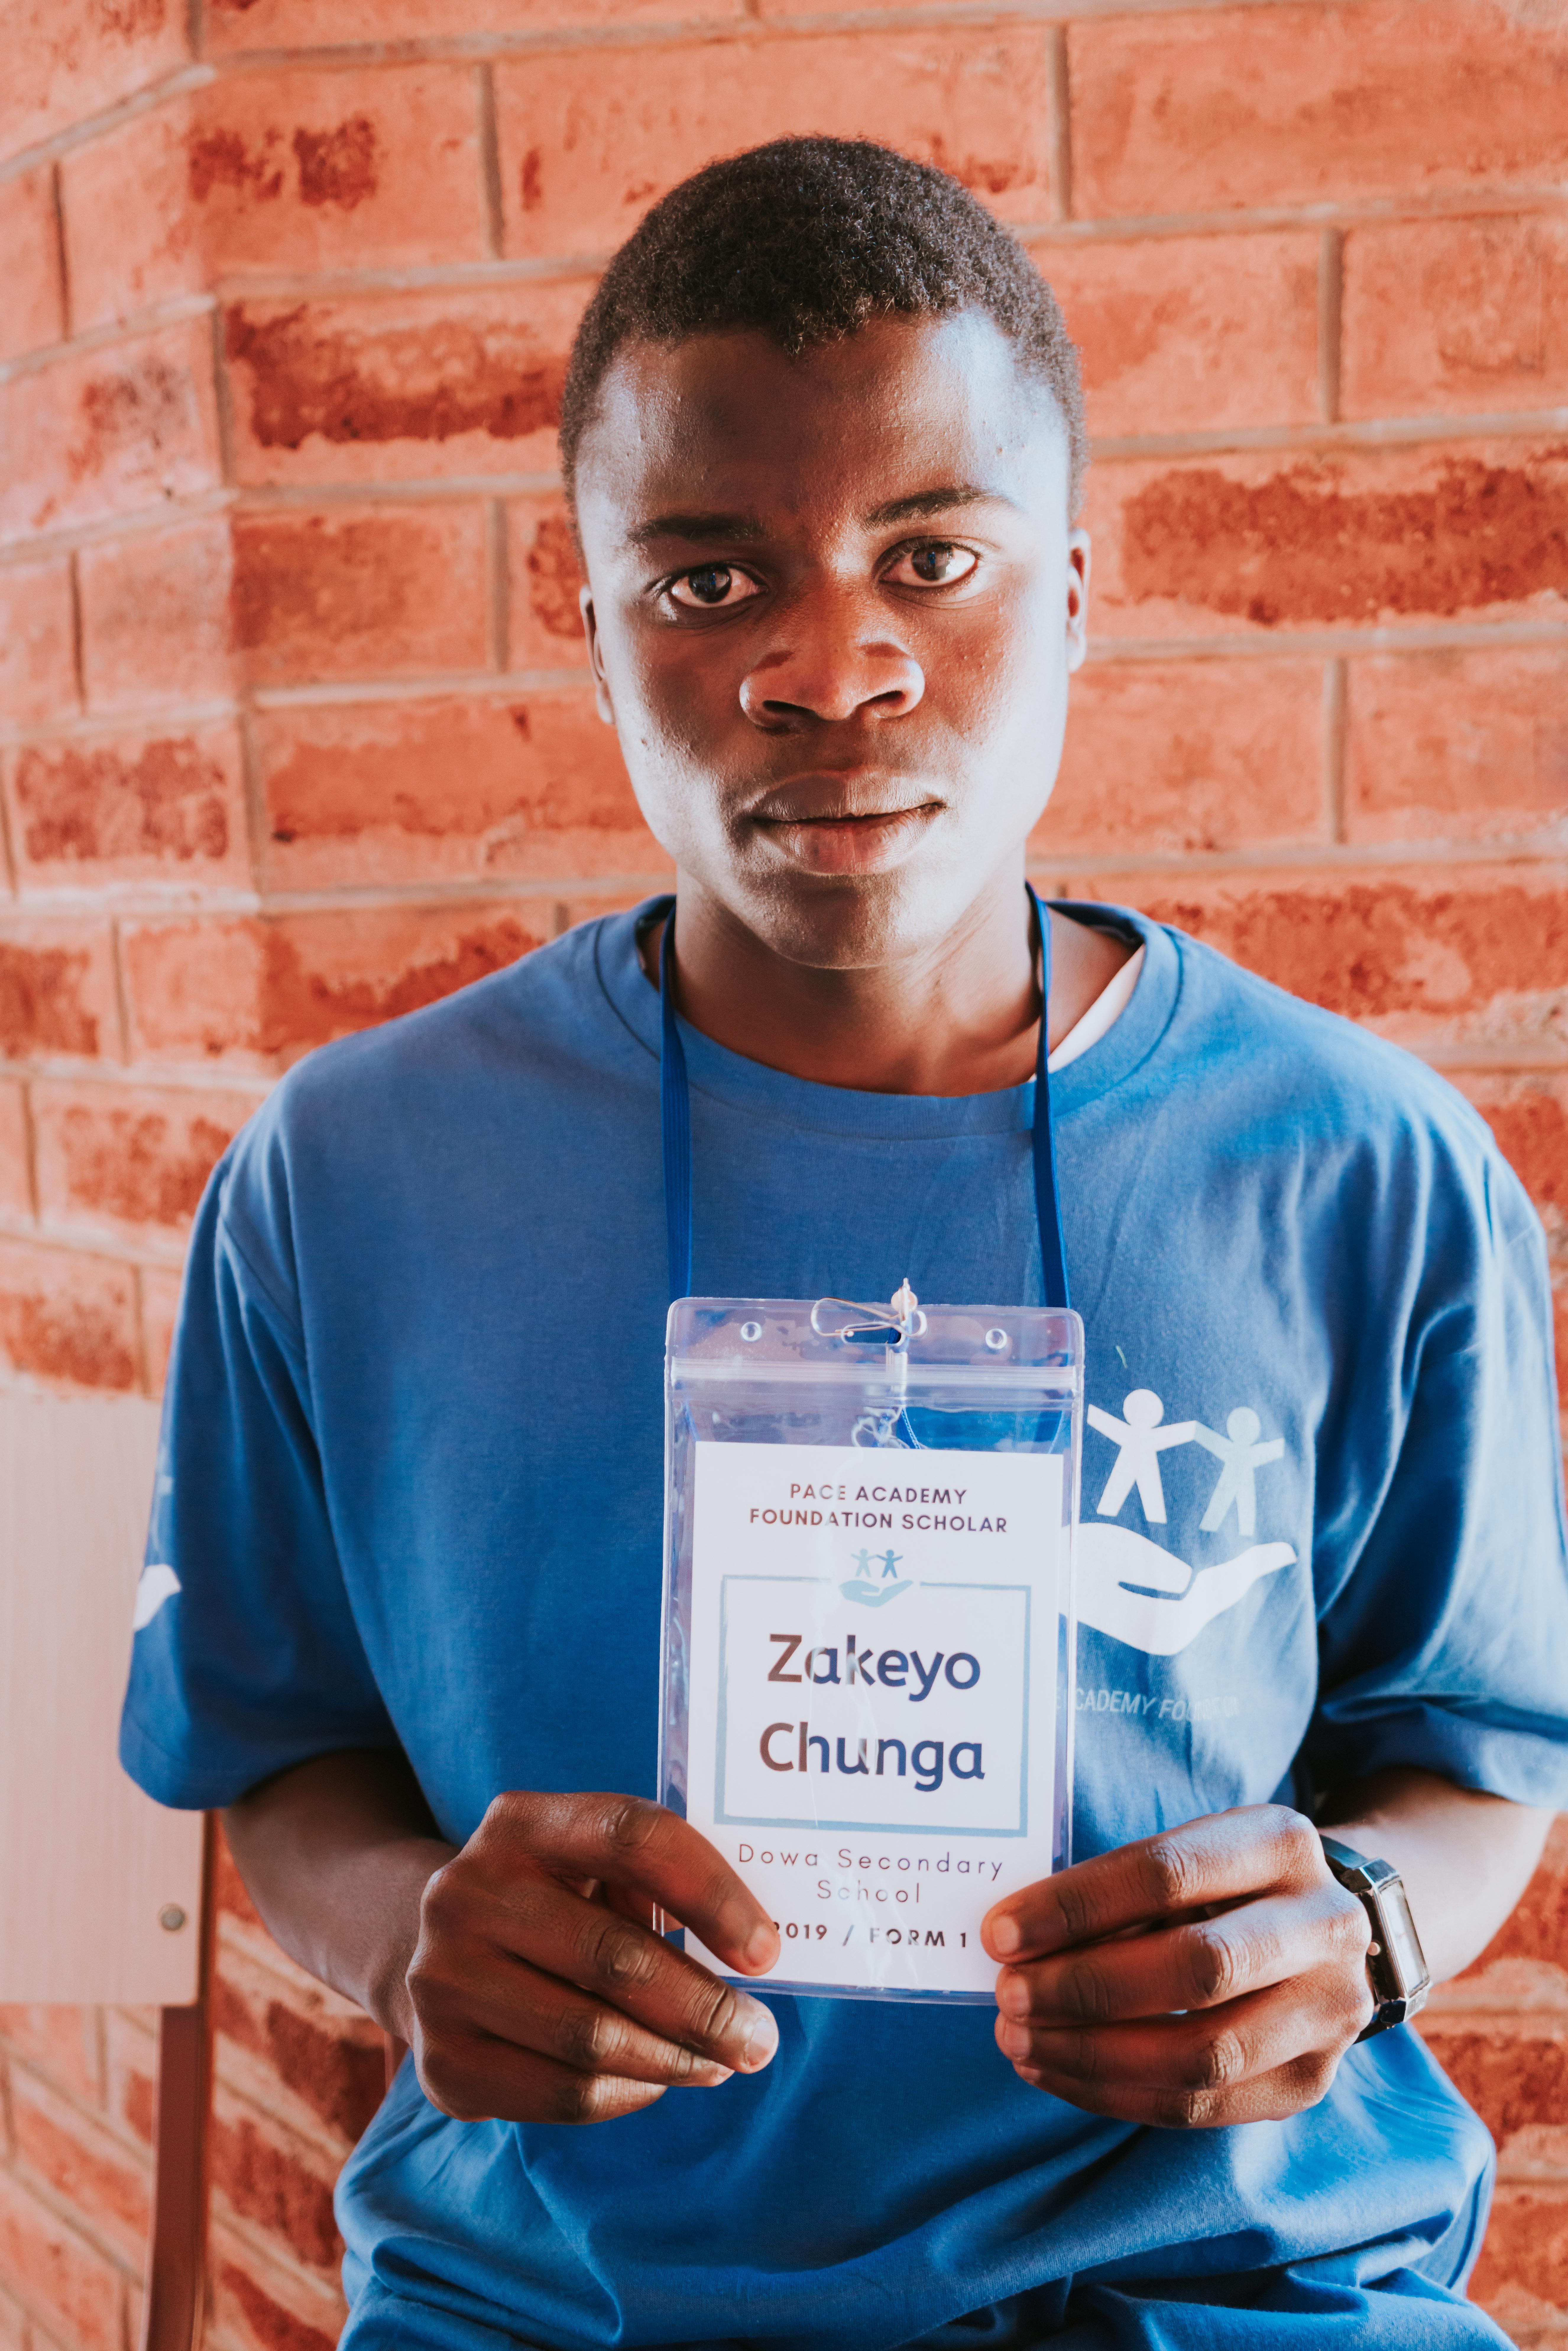 Zakeyo Chunga (Dowa Secondary School)